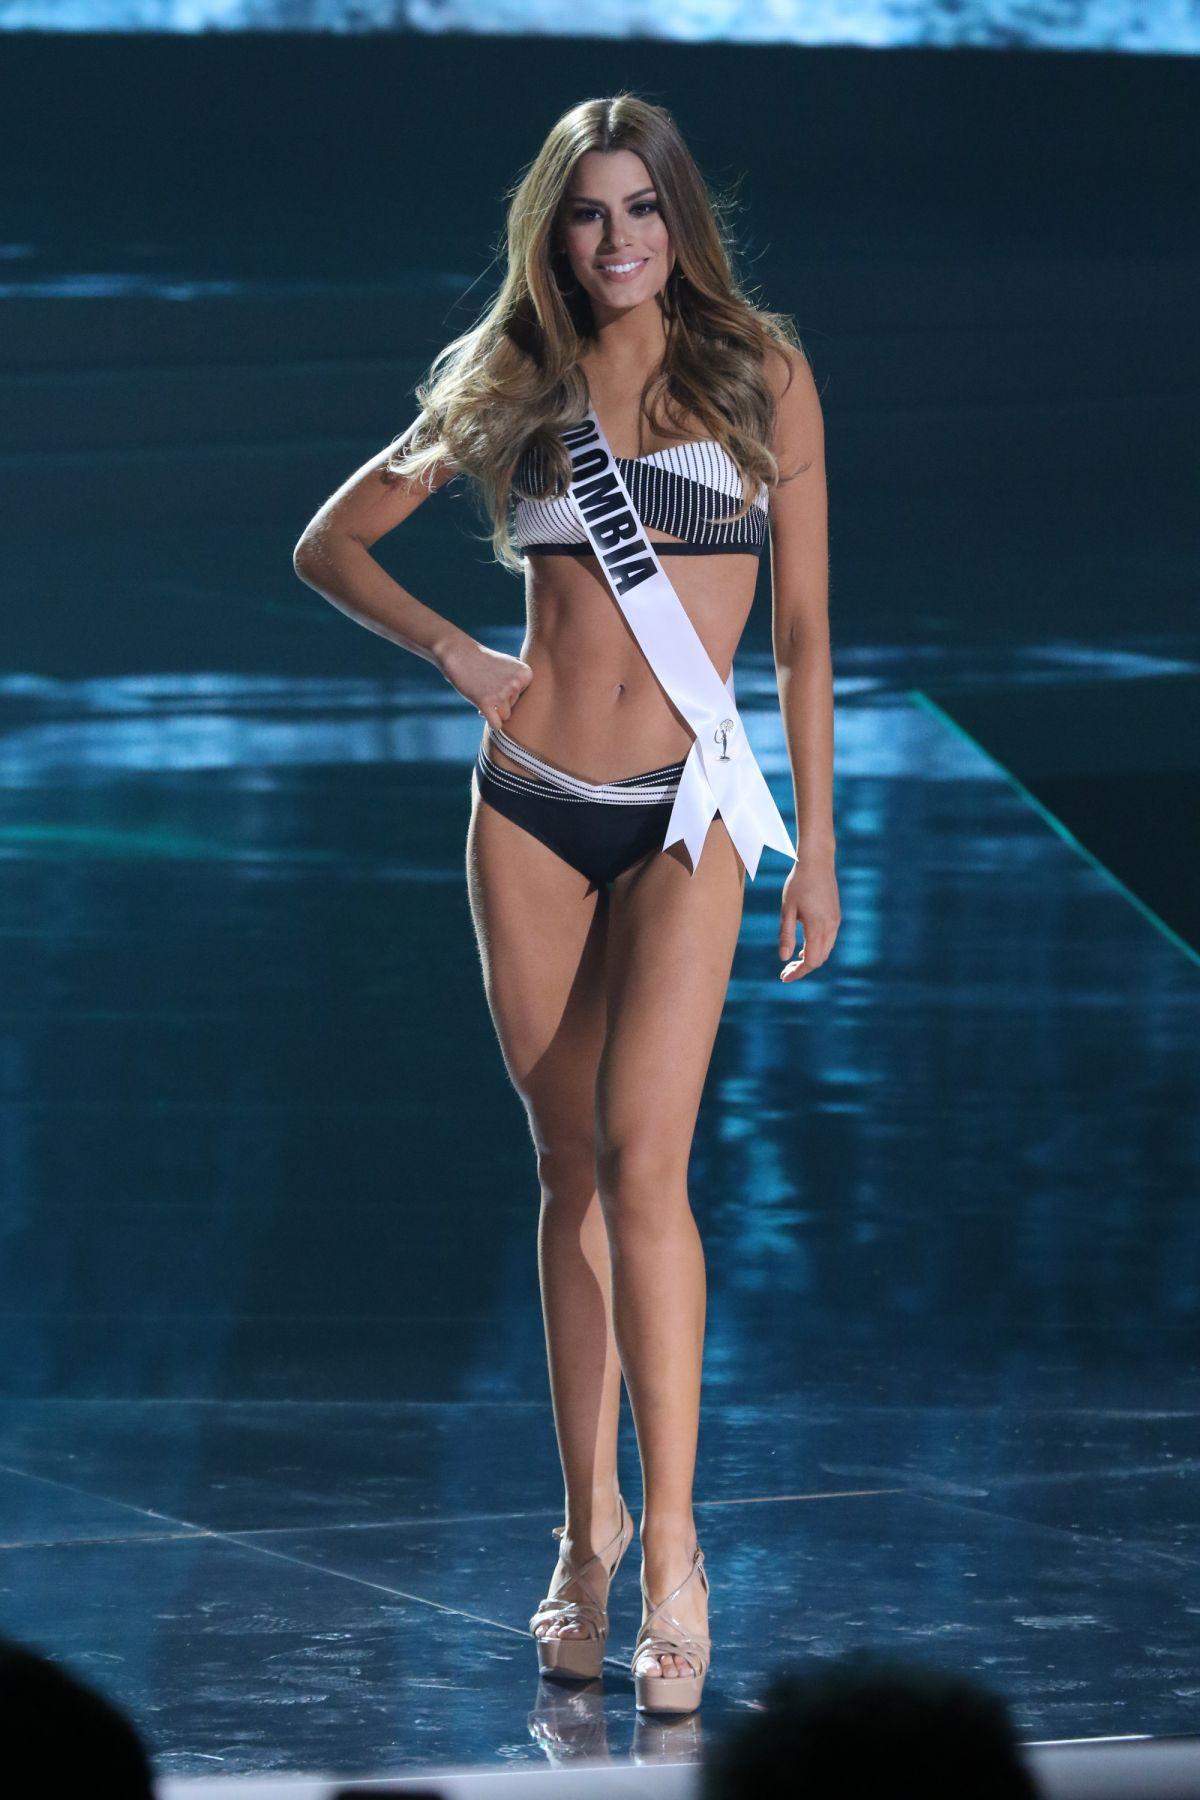 ARIADNA GUTIERREZ AREVALO - Miss Universe 2015 Preliminary Round 12/16/2015